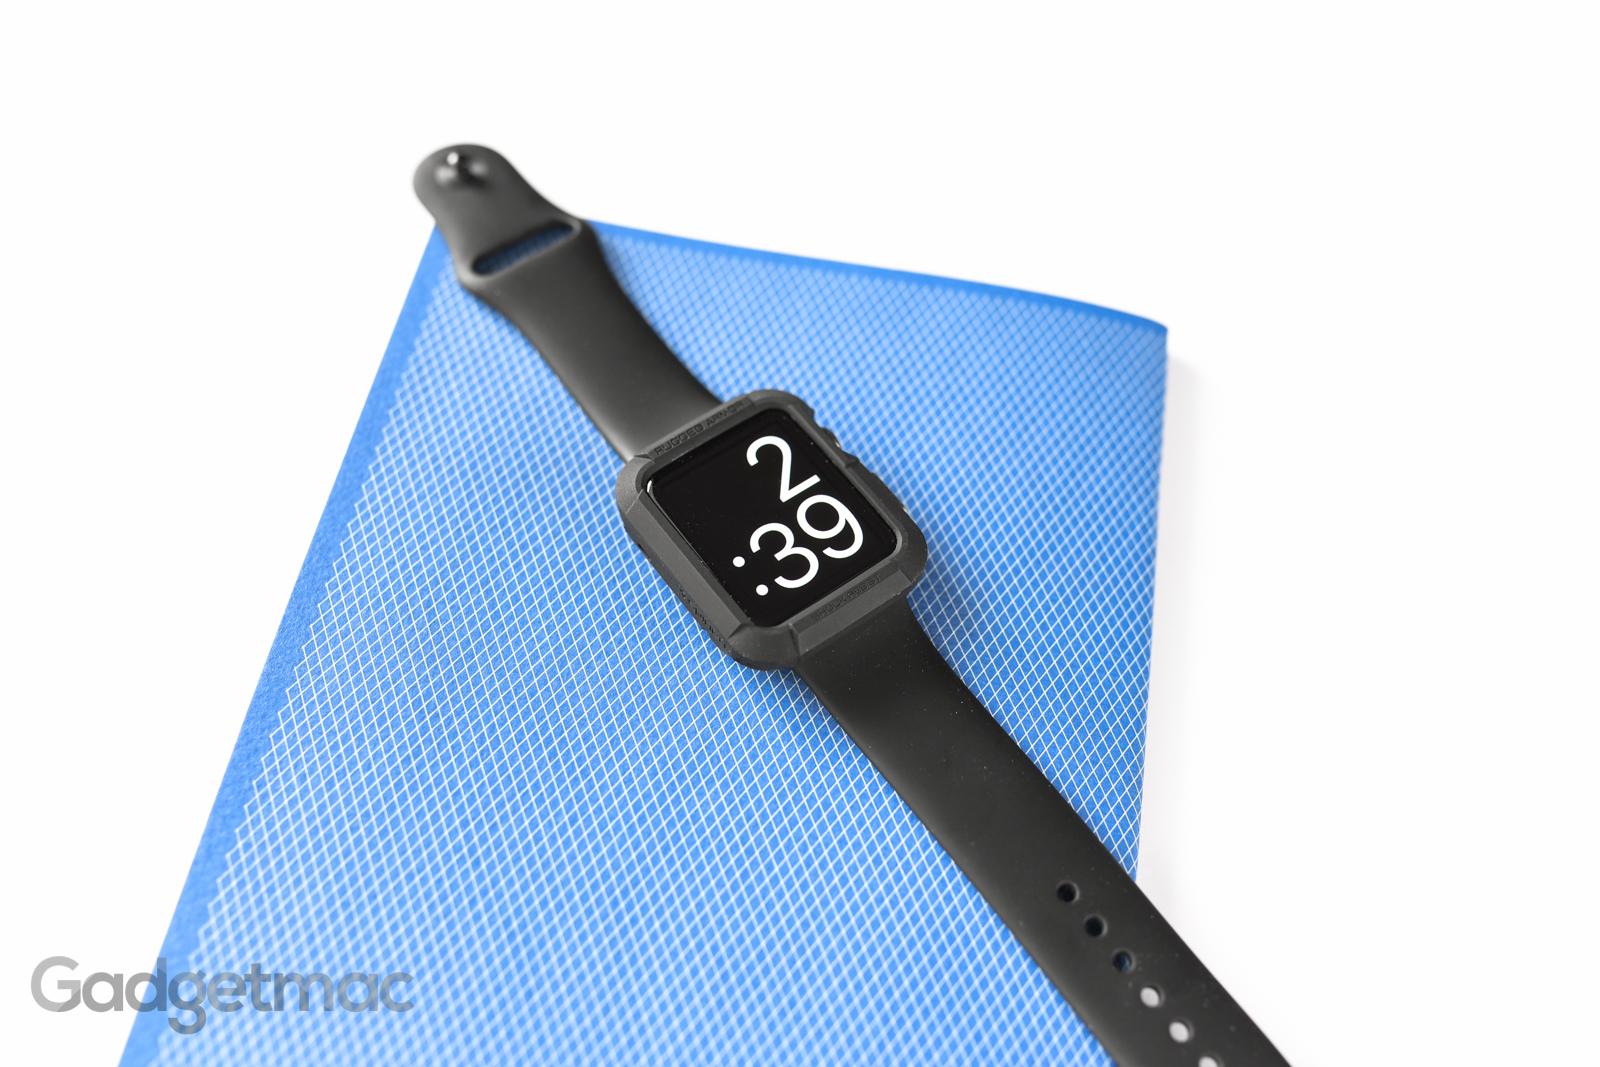 spigen-rugged-armor-case-for-apple-watch-space-gray-black.jpg